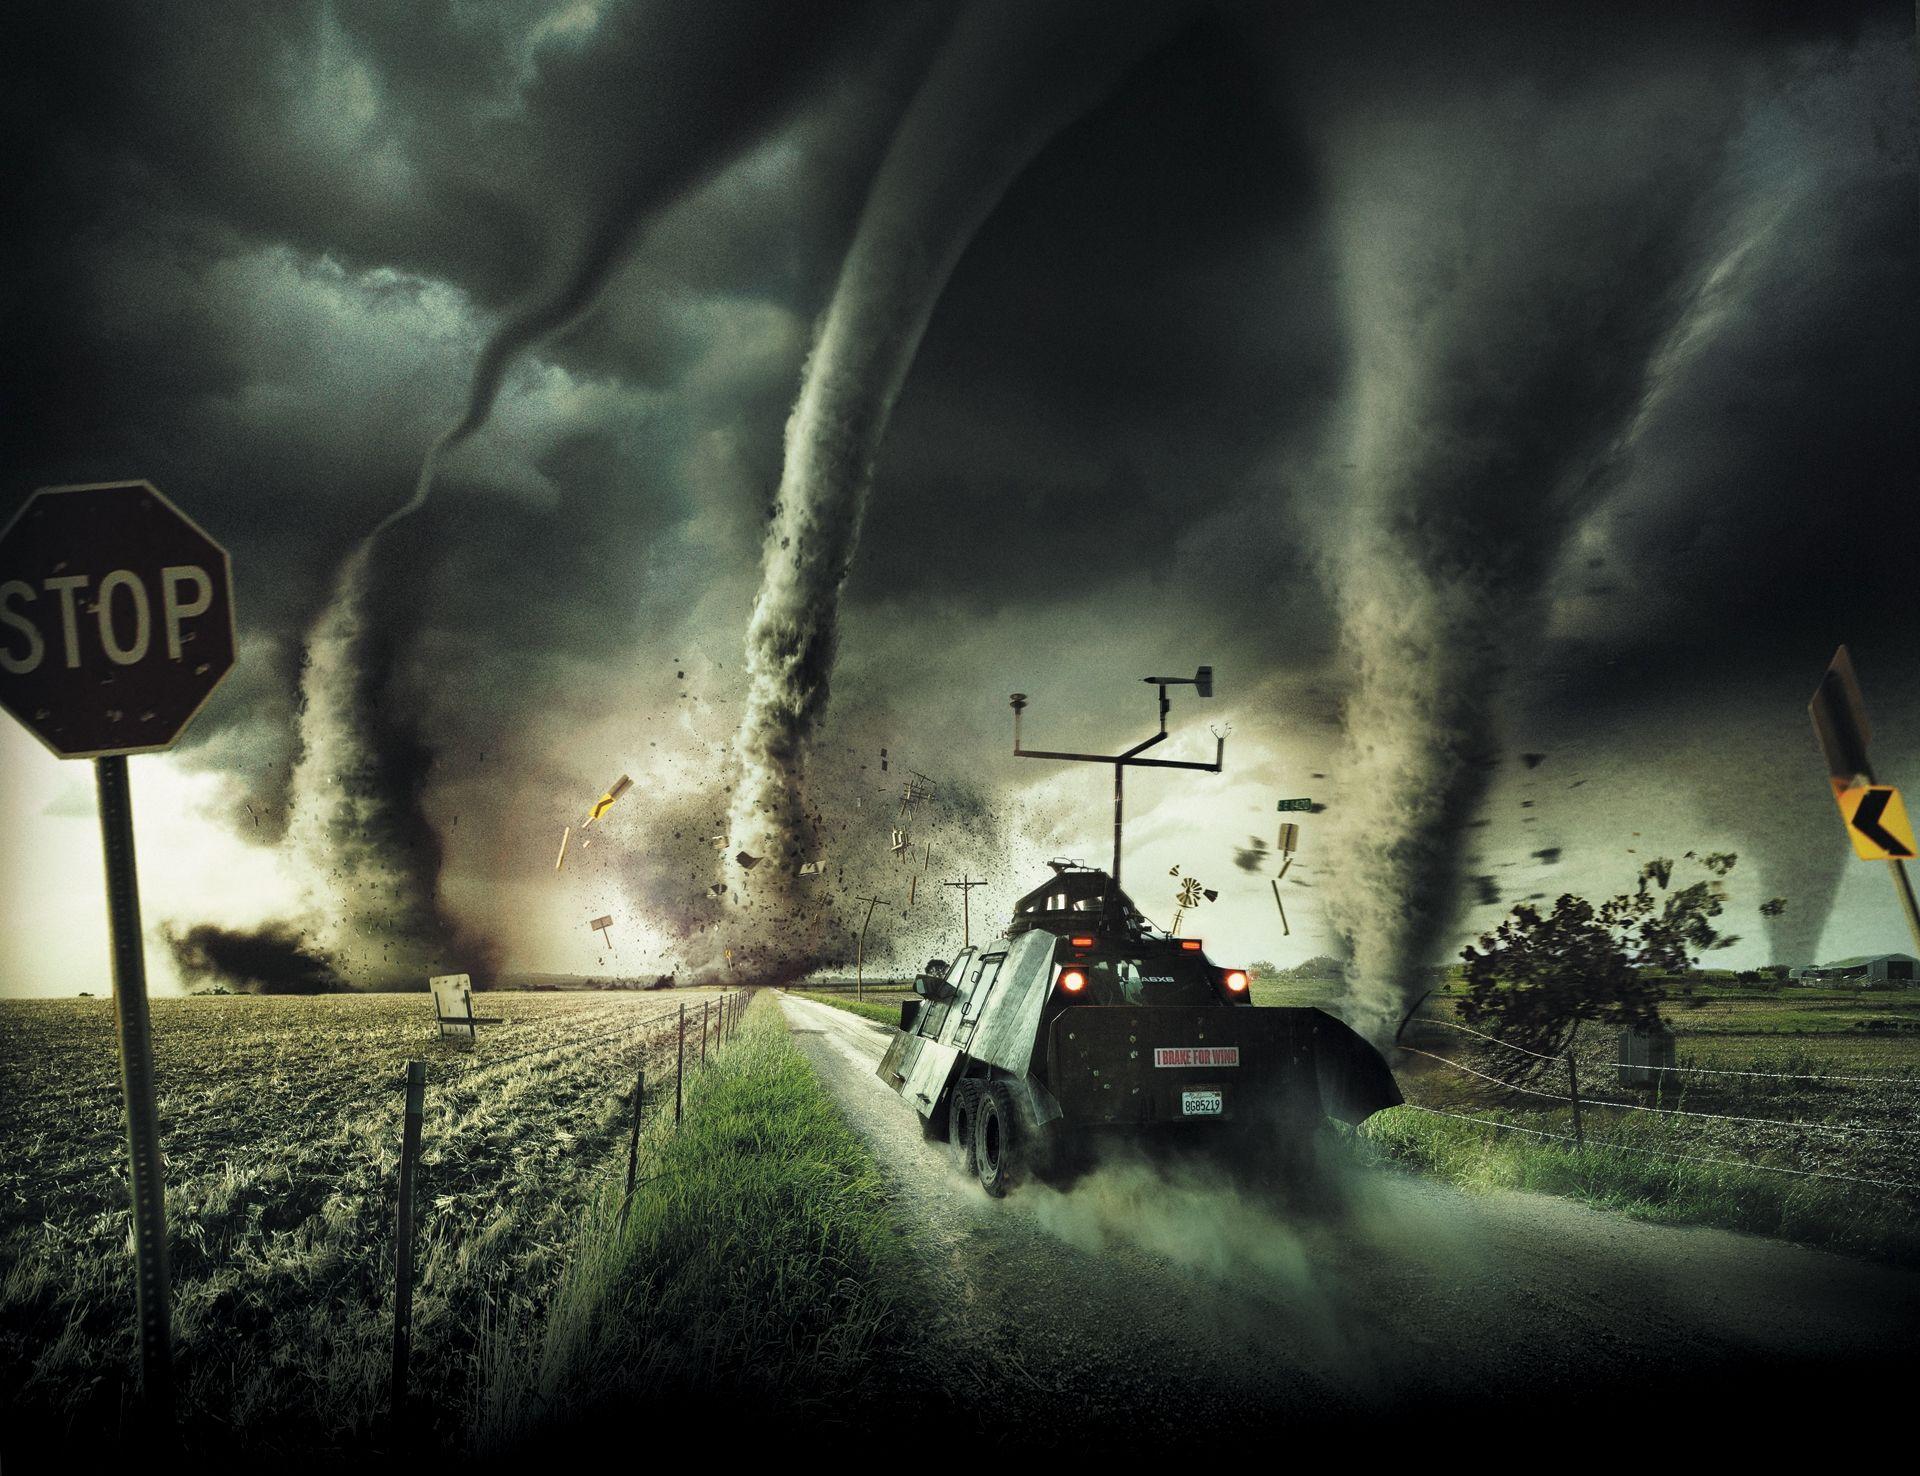 Director Of Tornado Alley Will Present Film At DMNS CatchCarri - Storm chaser gets struck lightning films